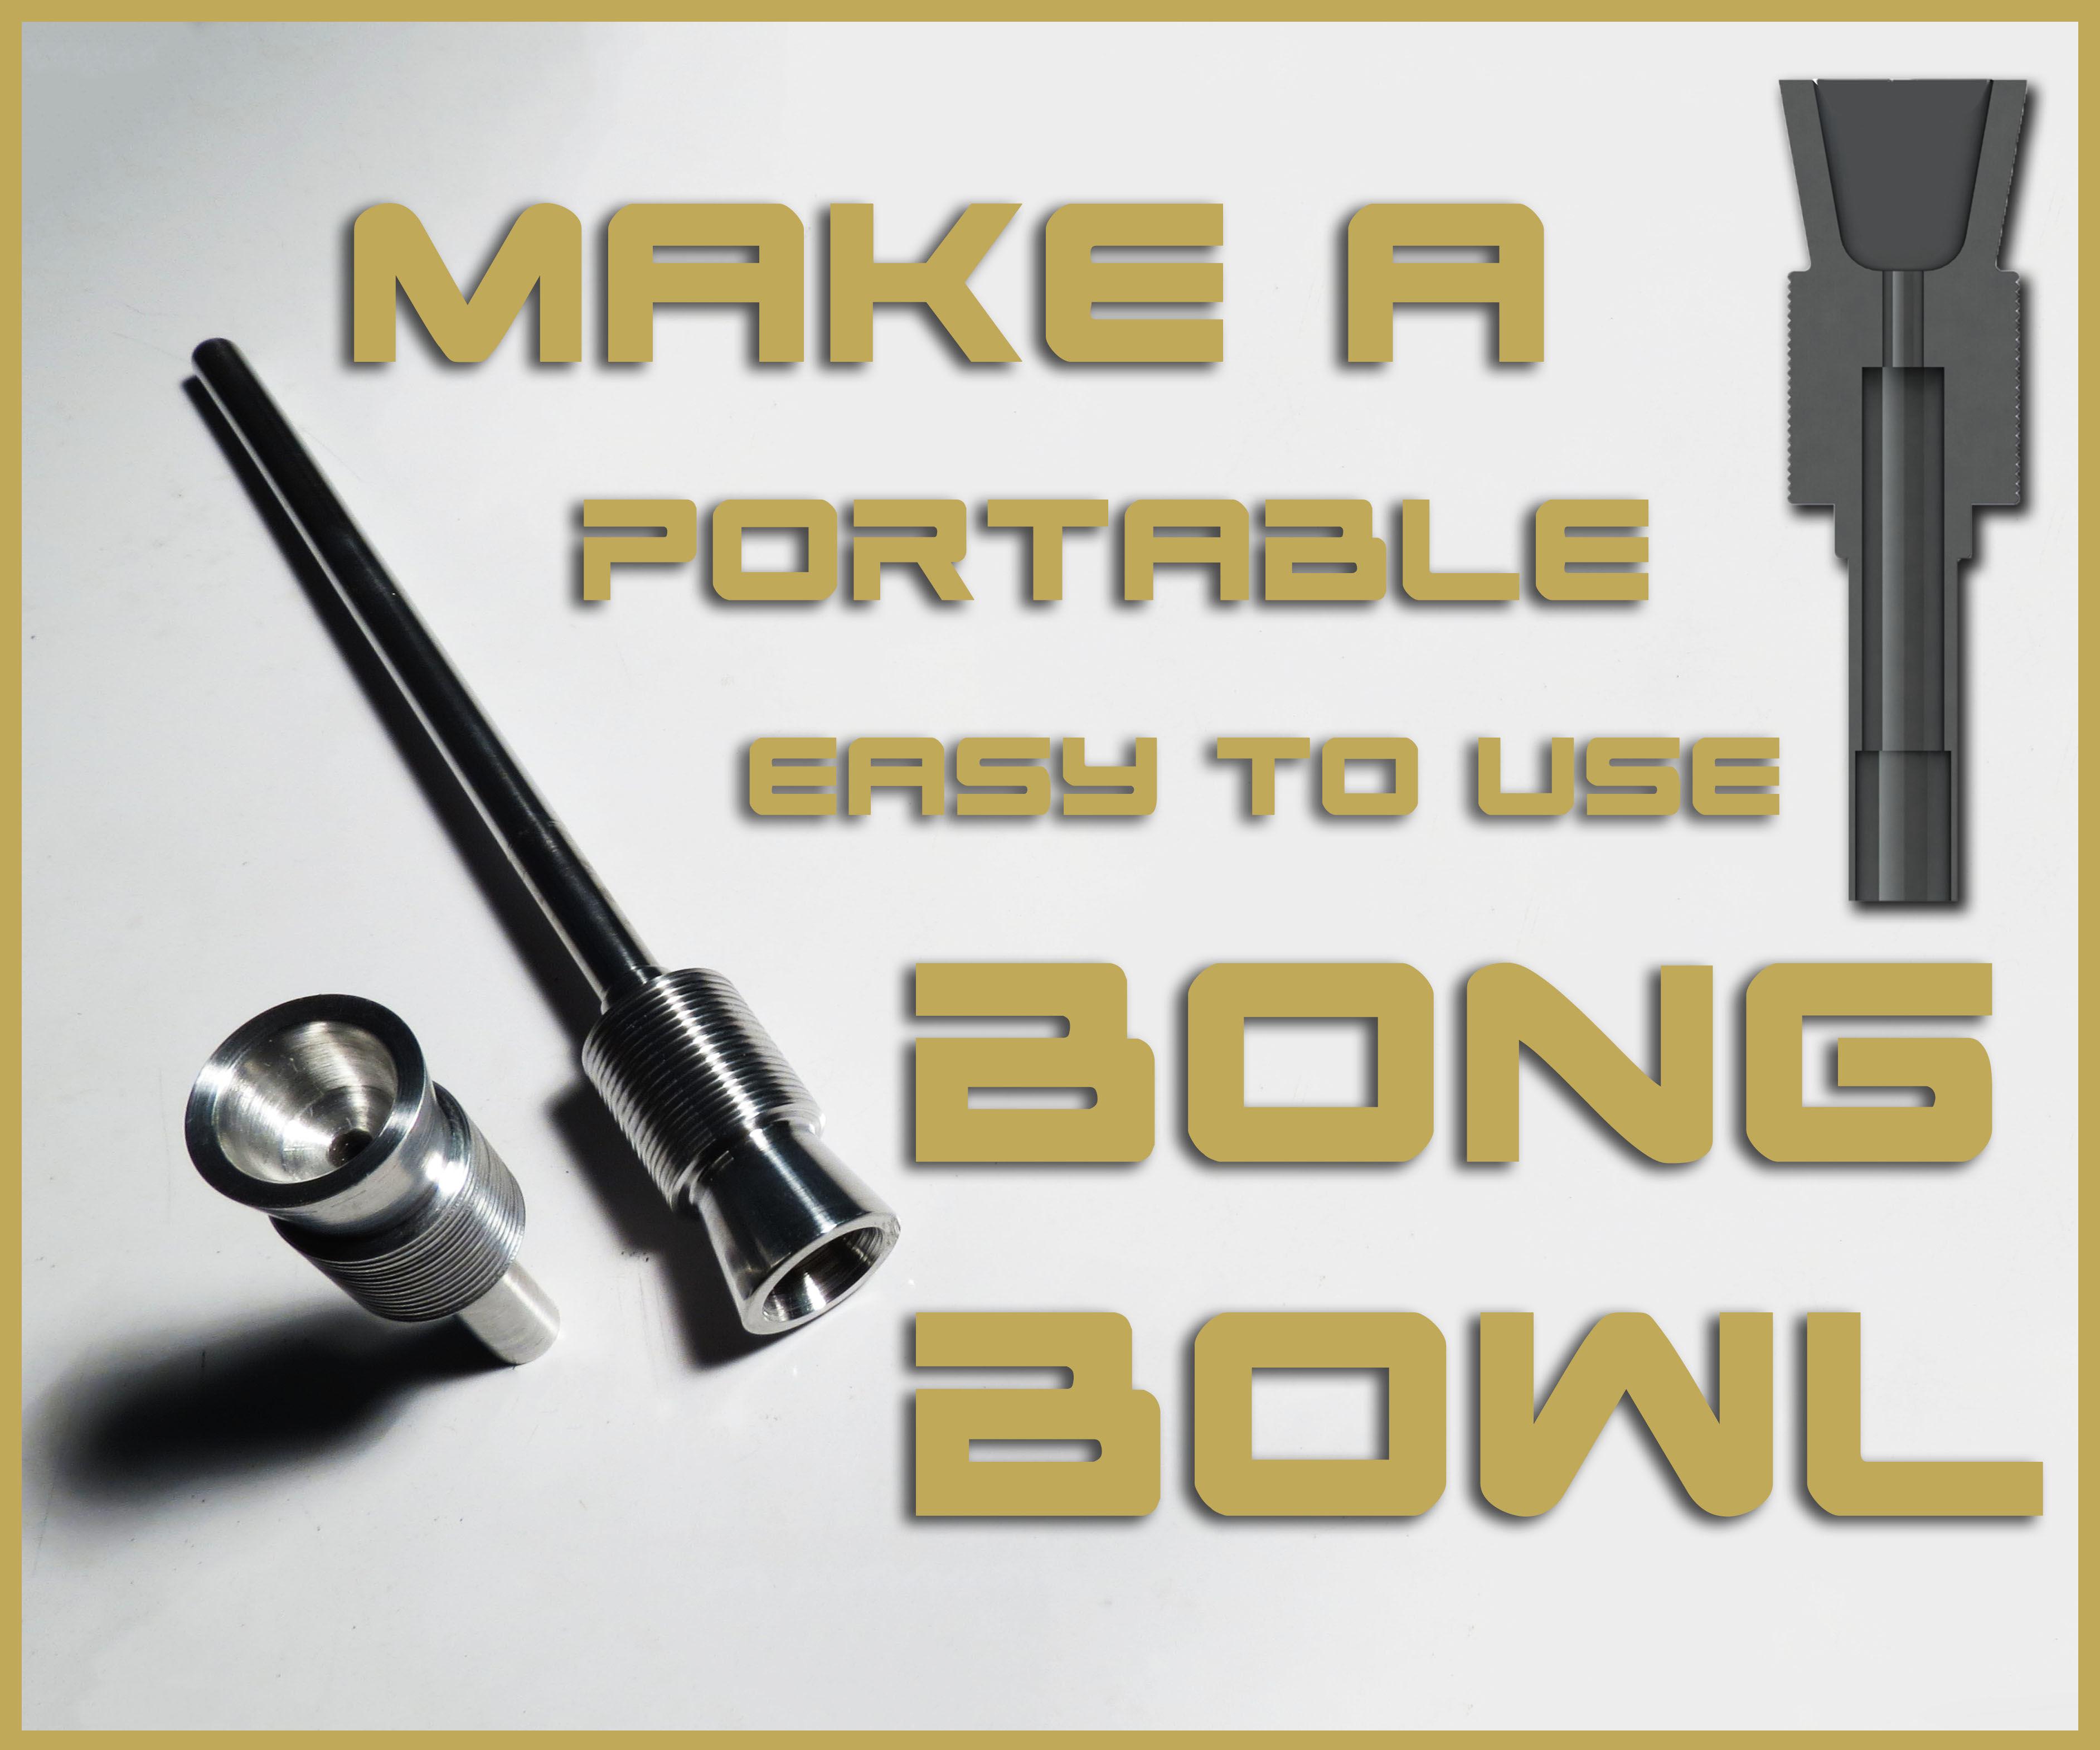 DIY Portable Water Pipe | Bong Bowl